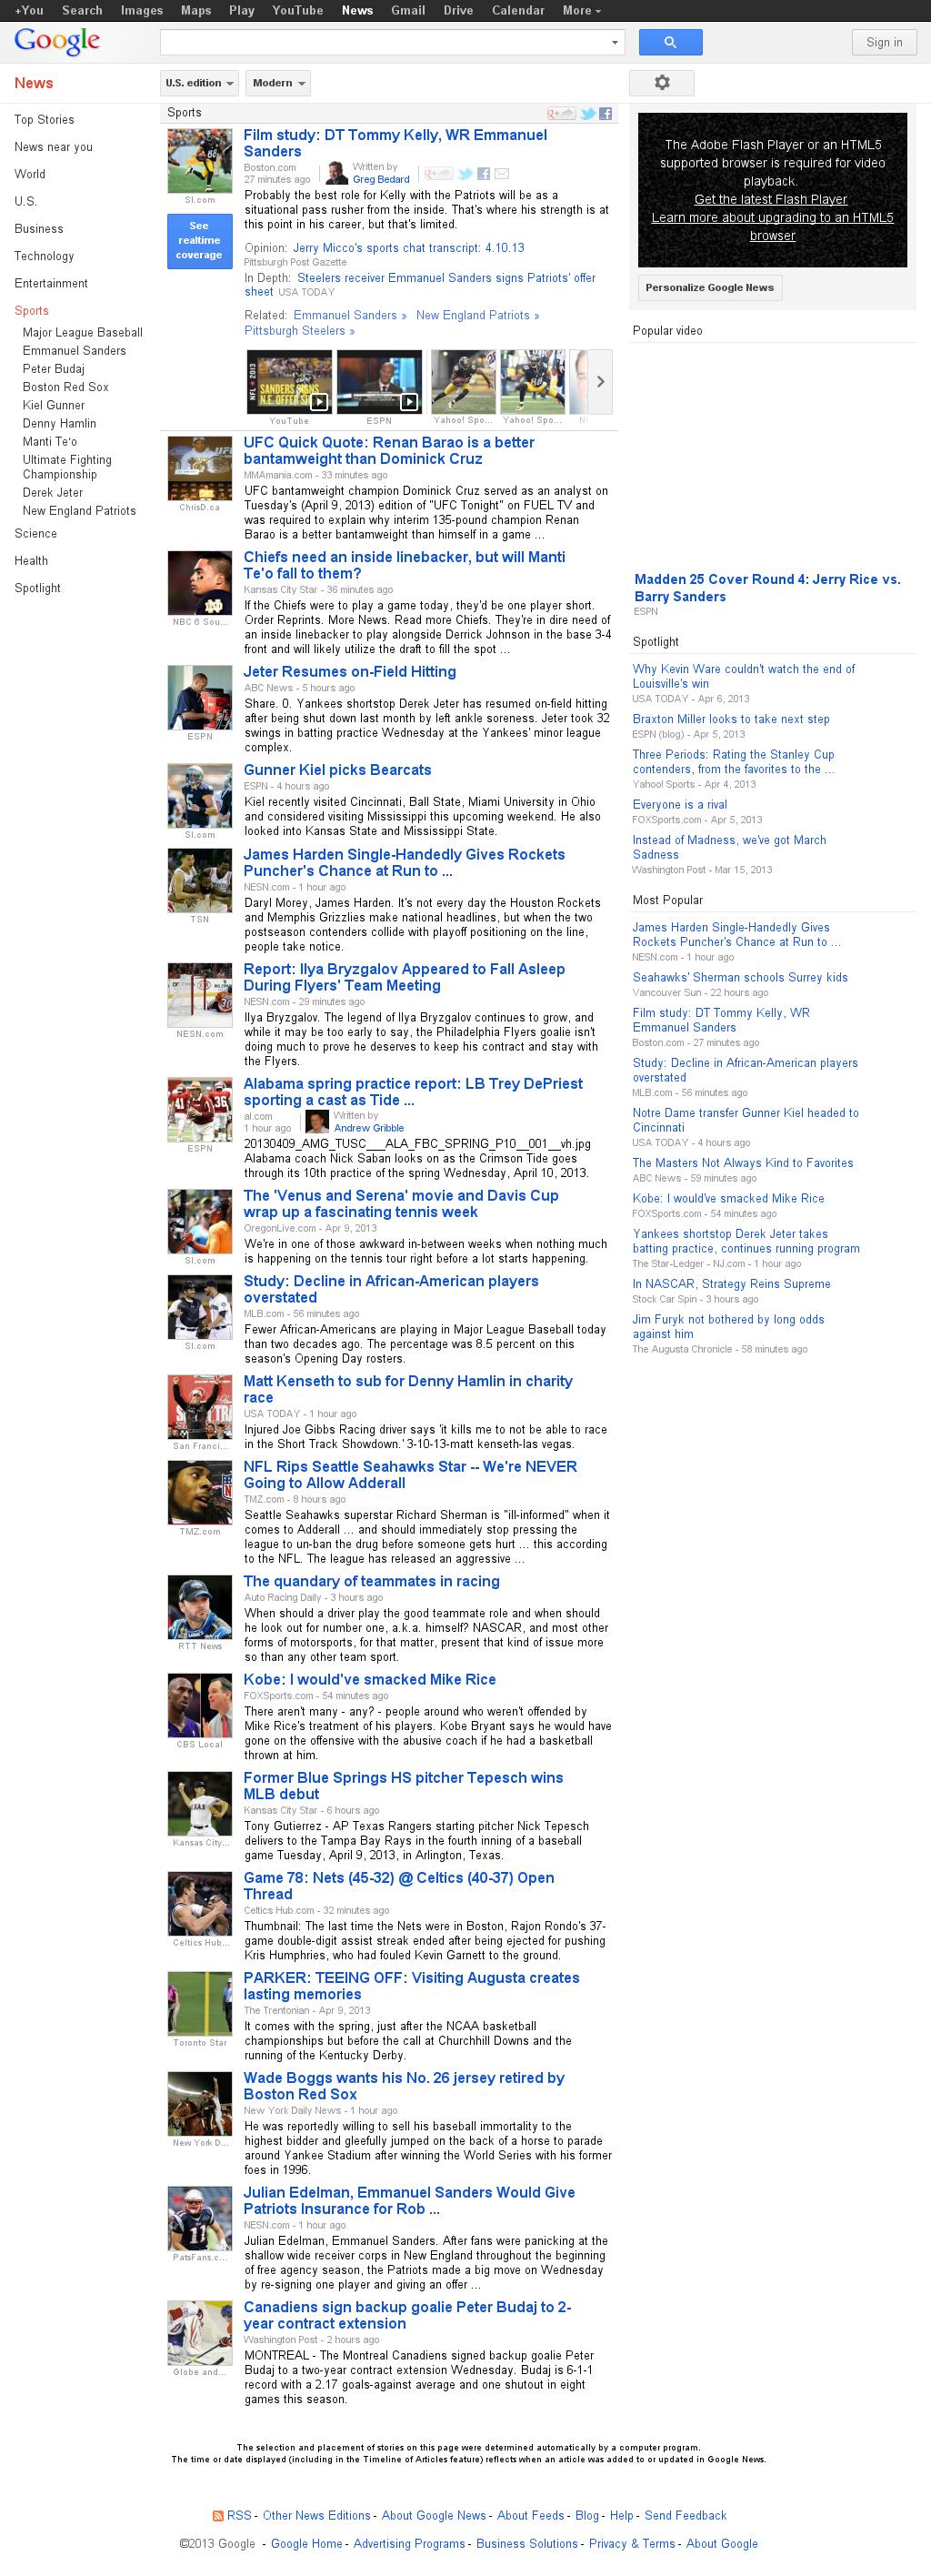 Google News: Sports at Wednesday April 10, 2013, 11:09 p.m. UTC